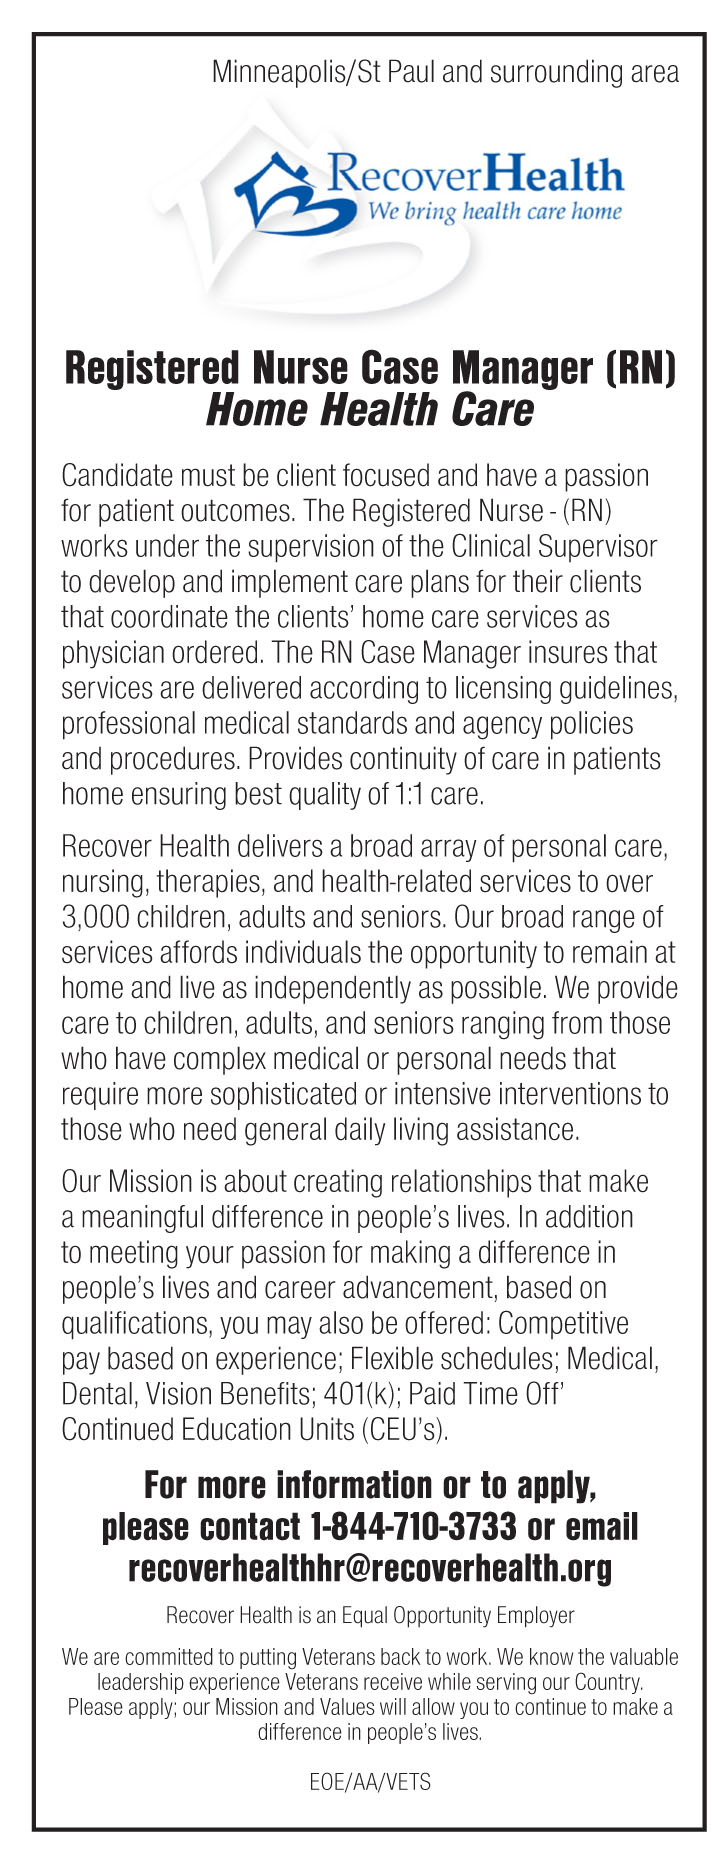 Registered Nurse Case Manager Rn Home Health Care Job In